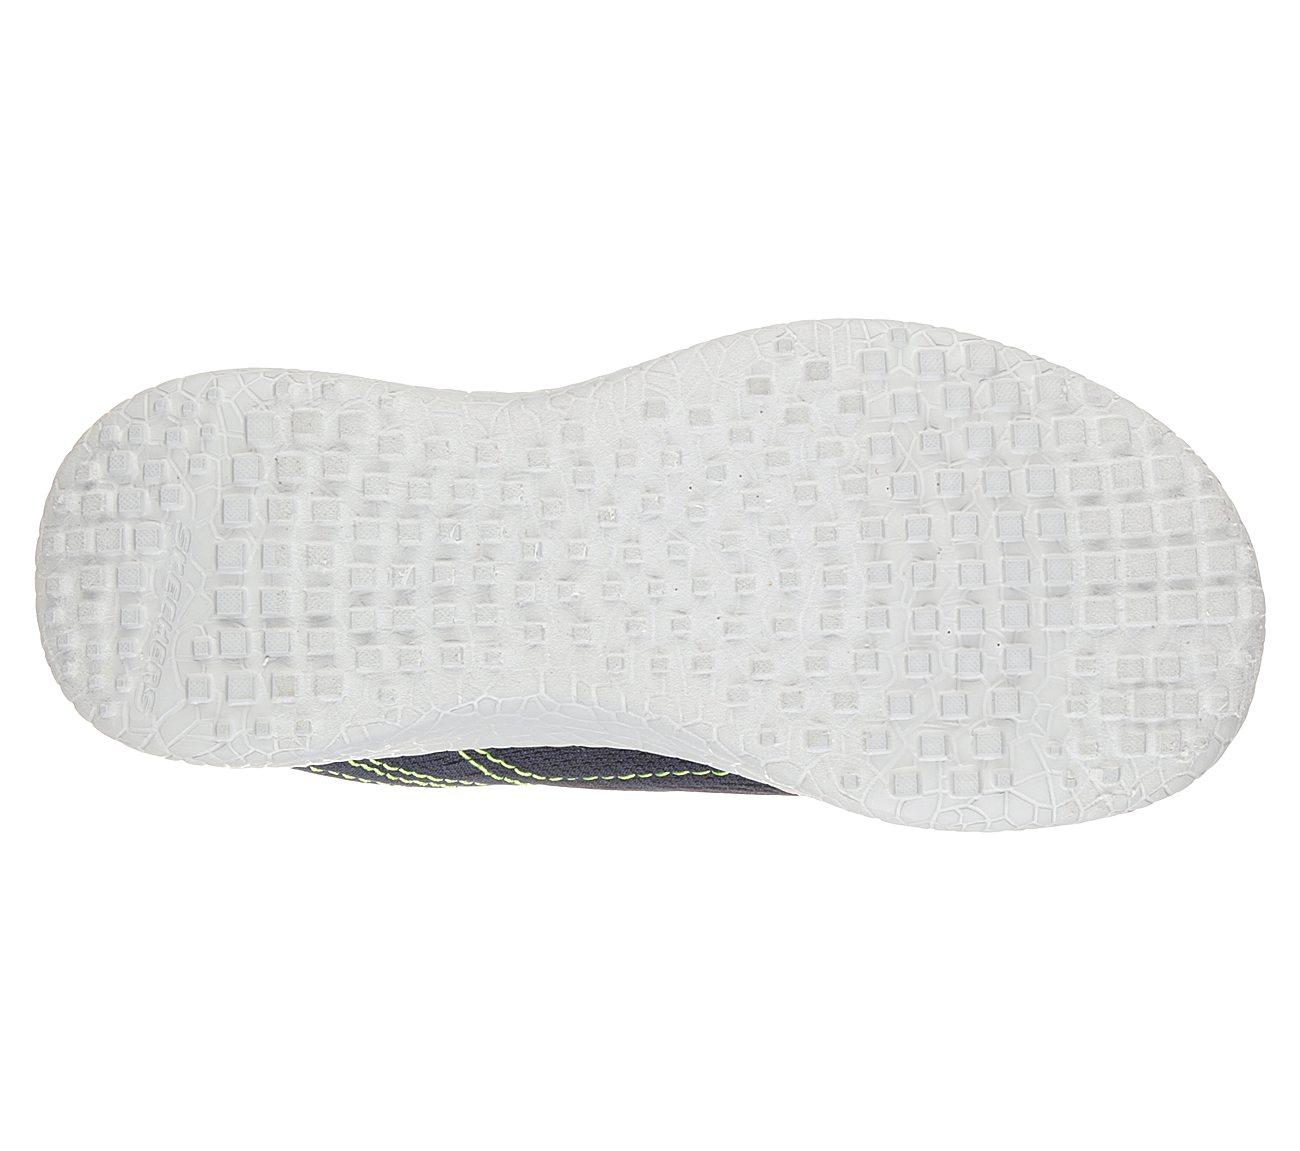 Second Wind SKECHERS Sport Shoes